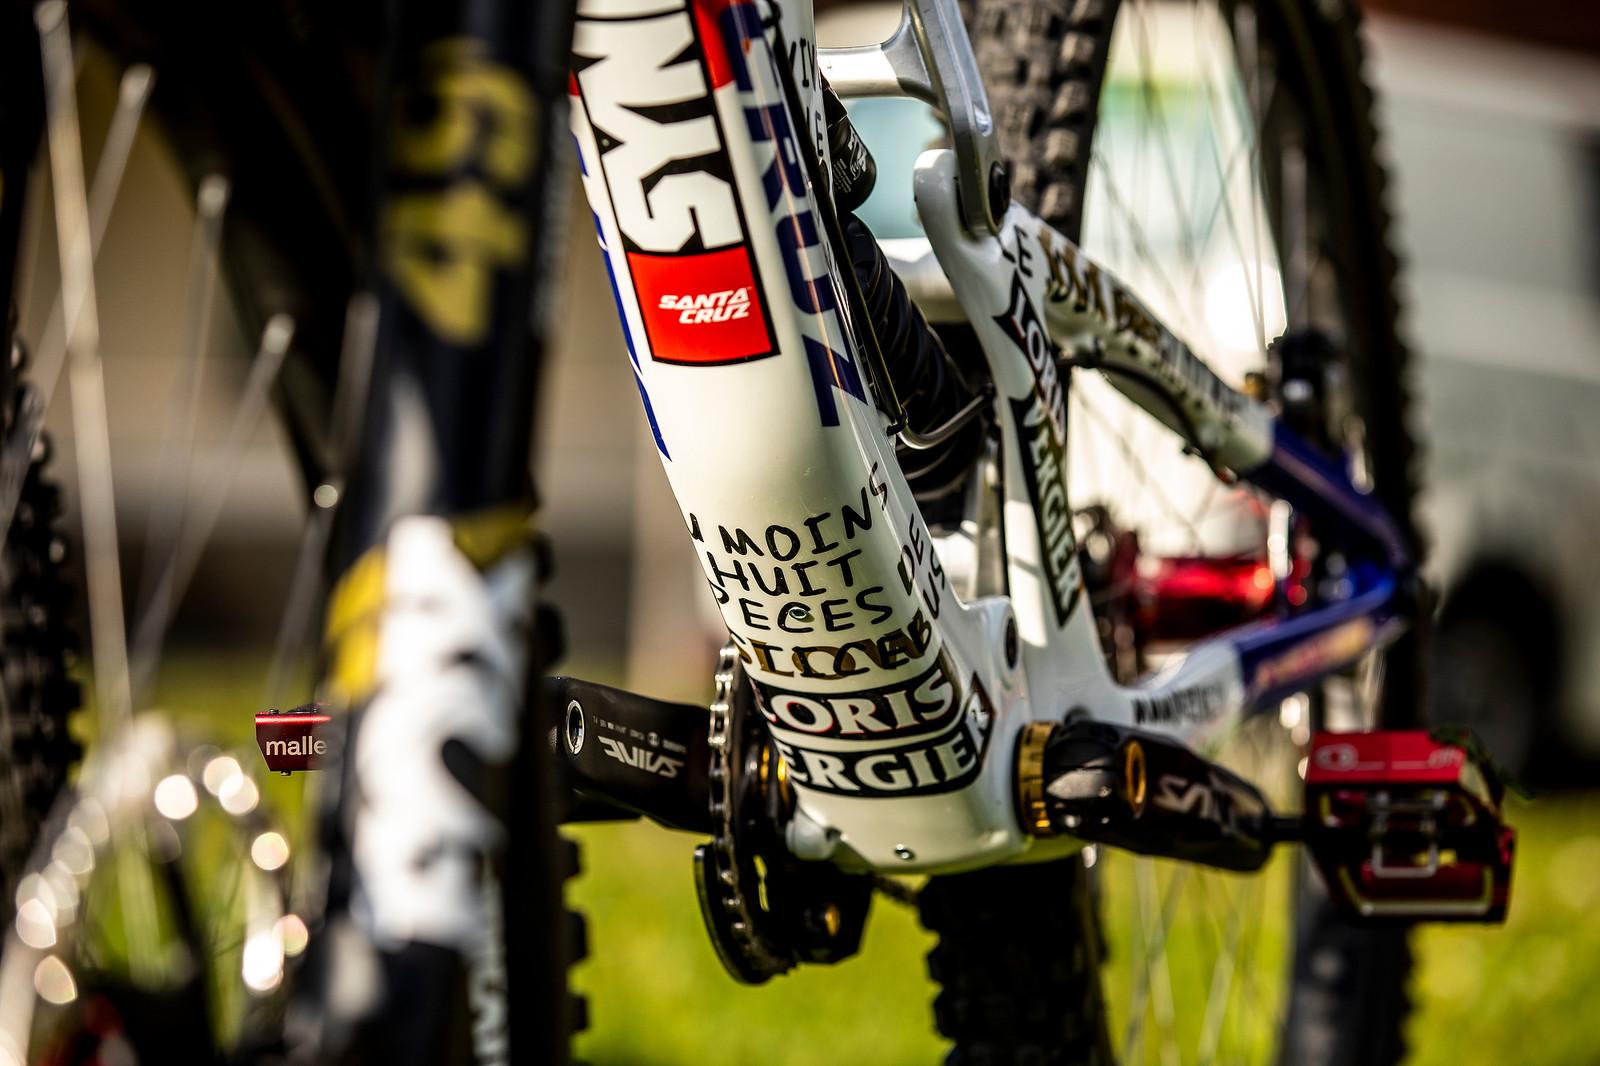 Lenzer18 O5A1616 - WORLD CHAMPS BIKES - Loris Vergier's Santa Cruz V10s - Mountain Biking Pictures - Vital MTB